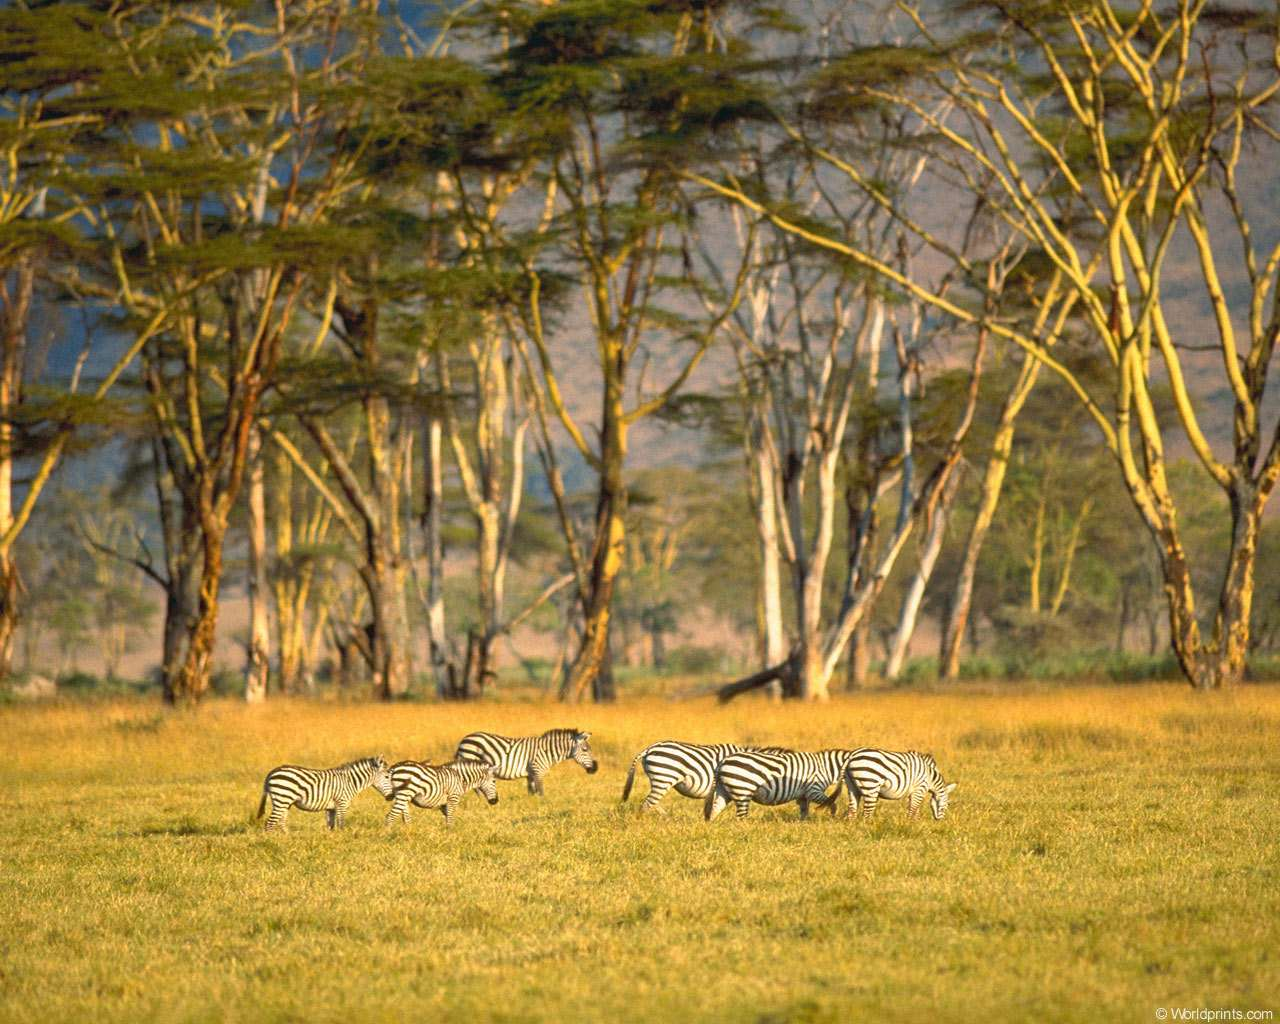 Среда обитания зебры, фото обои, фотография картинка